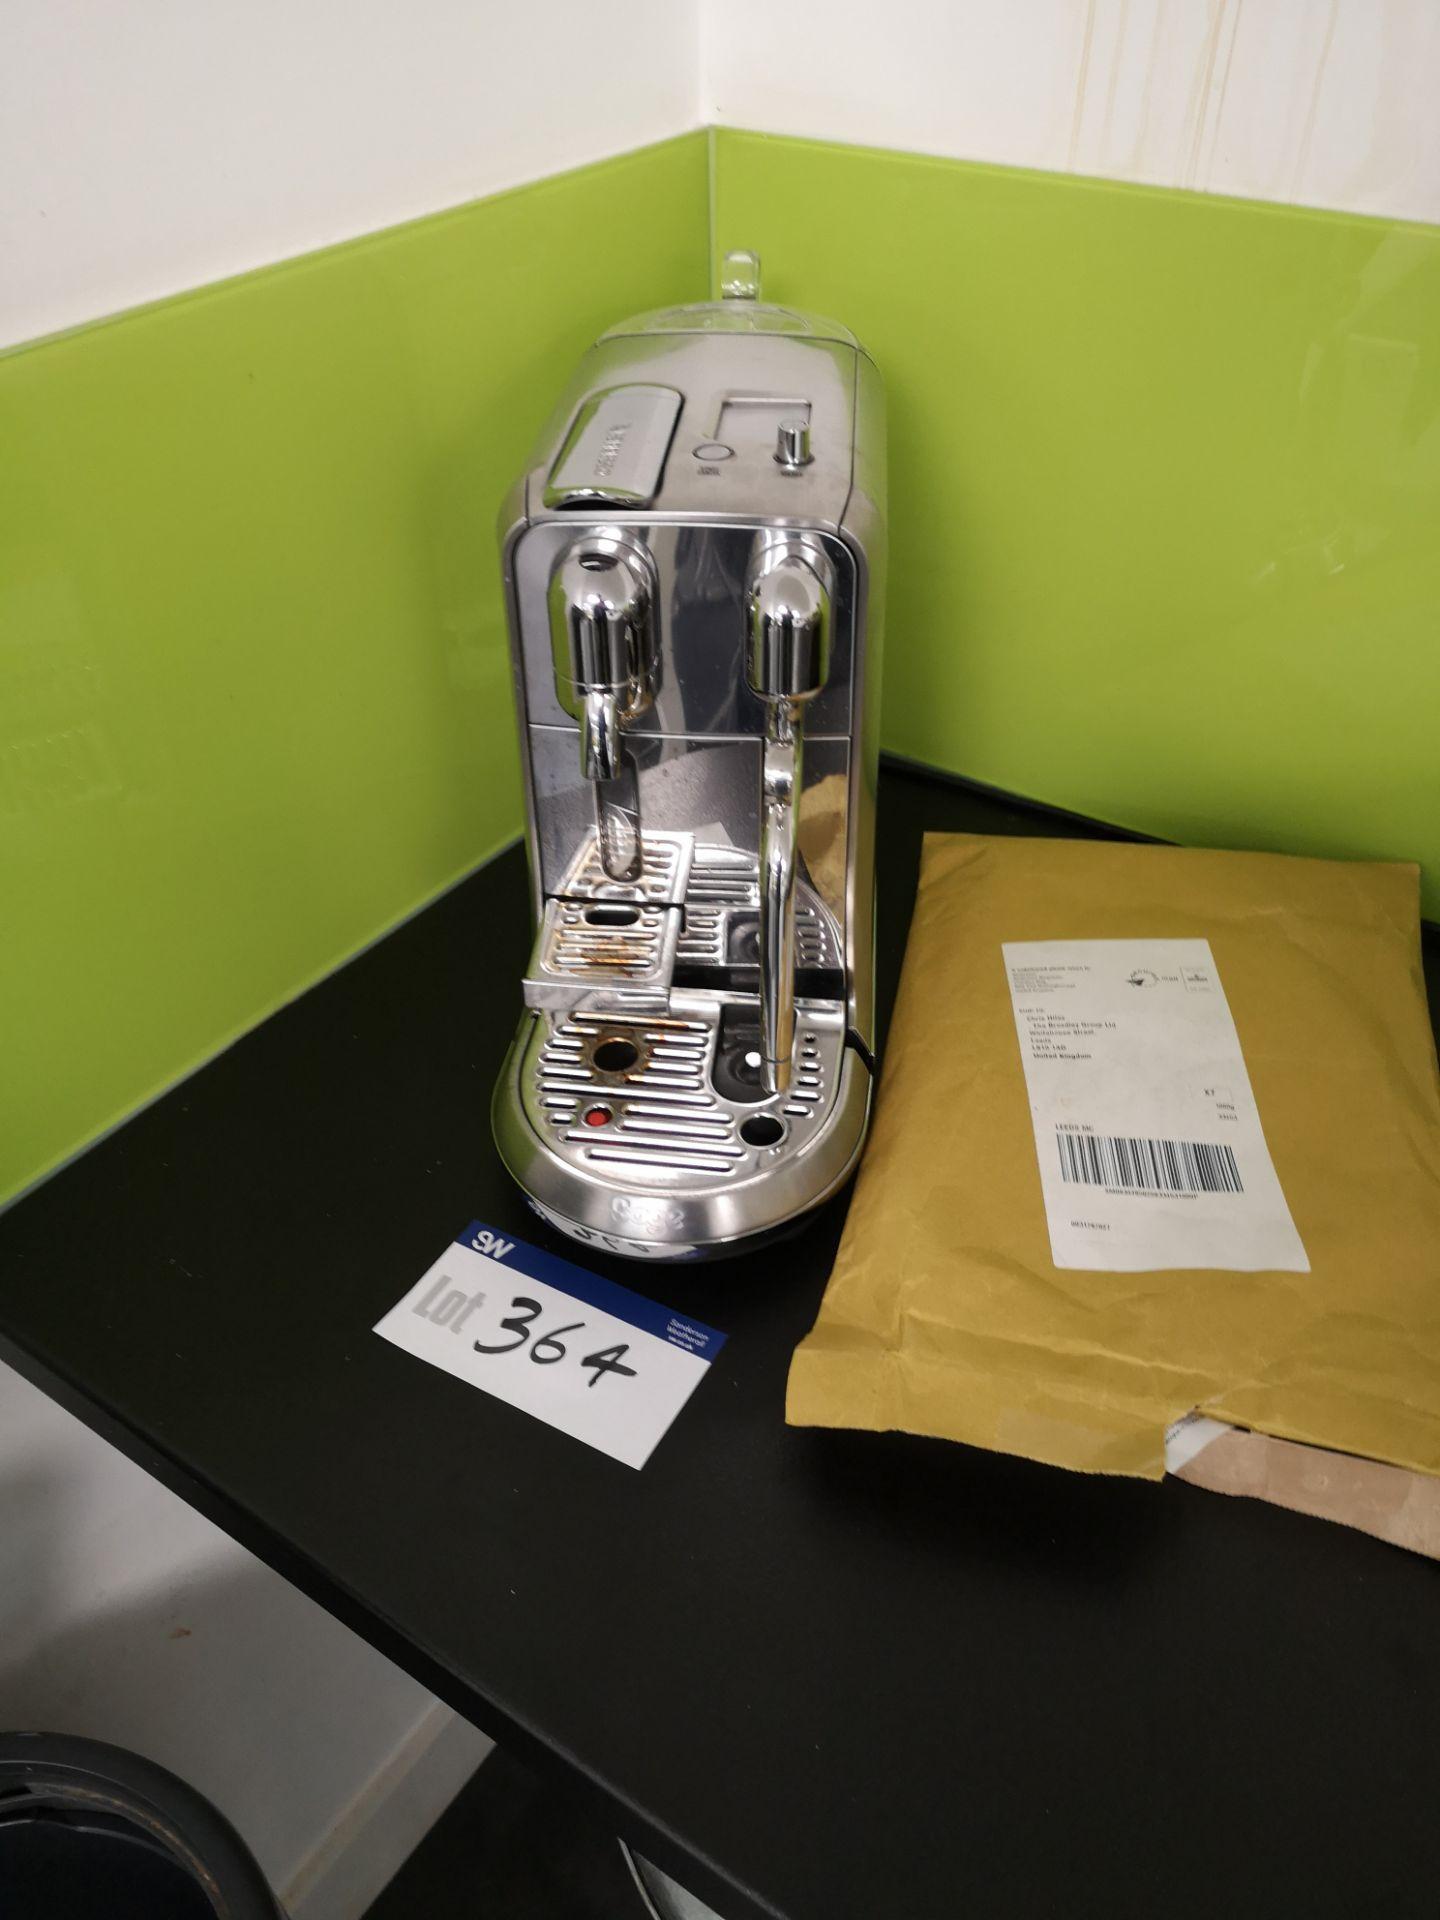 Lot 364 - Sage Nespresso Coffee Machine (LOT LOCATED AT 8 WH